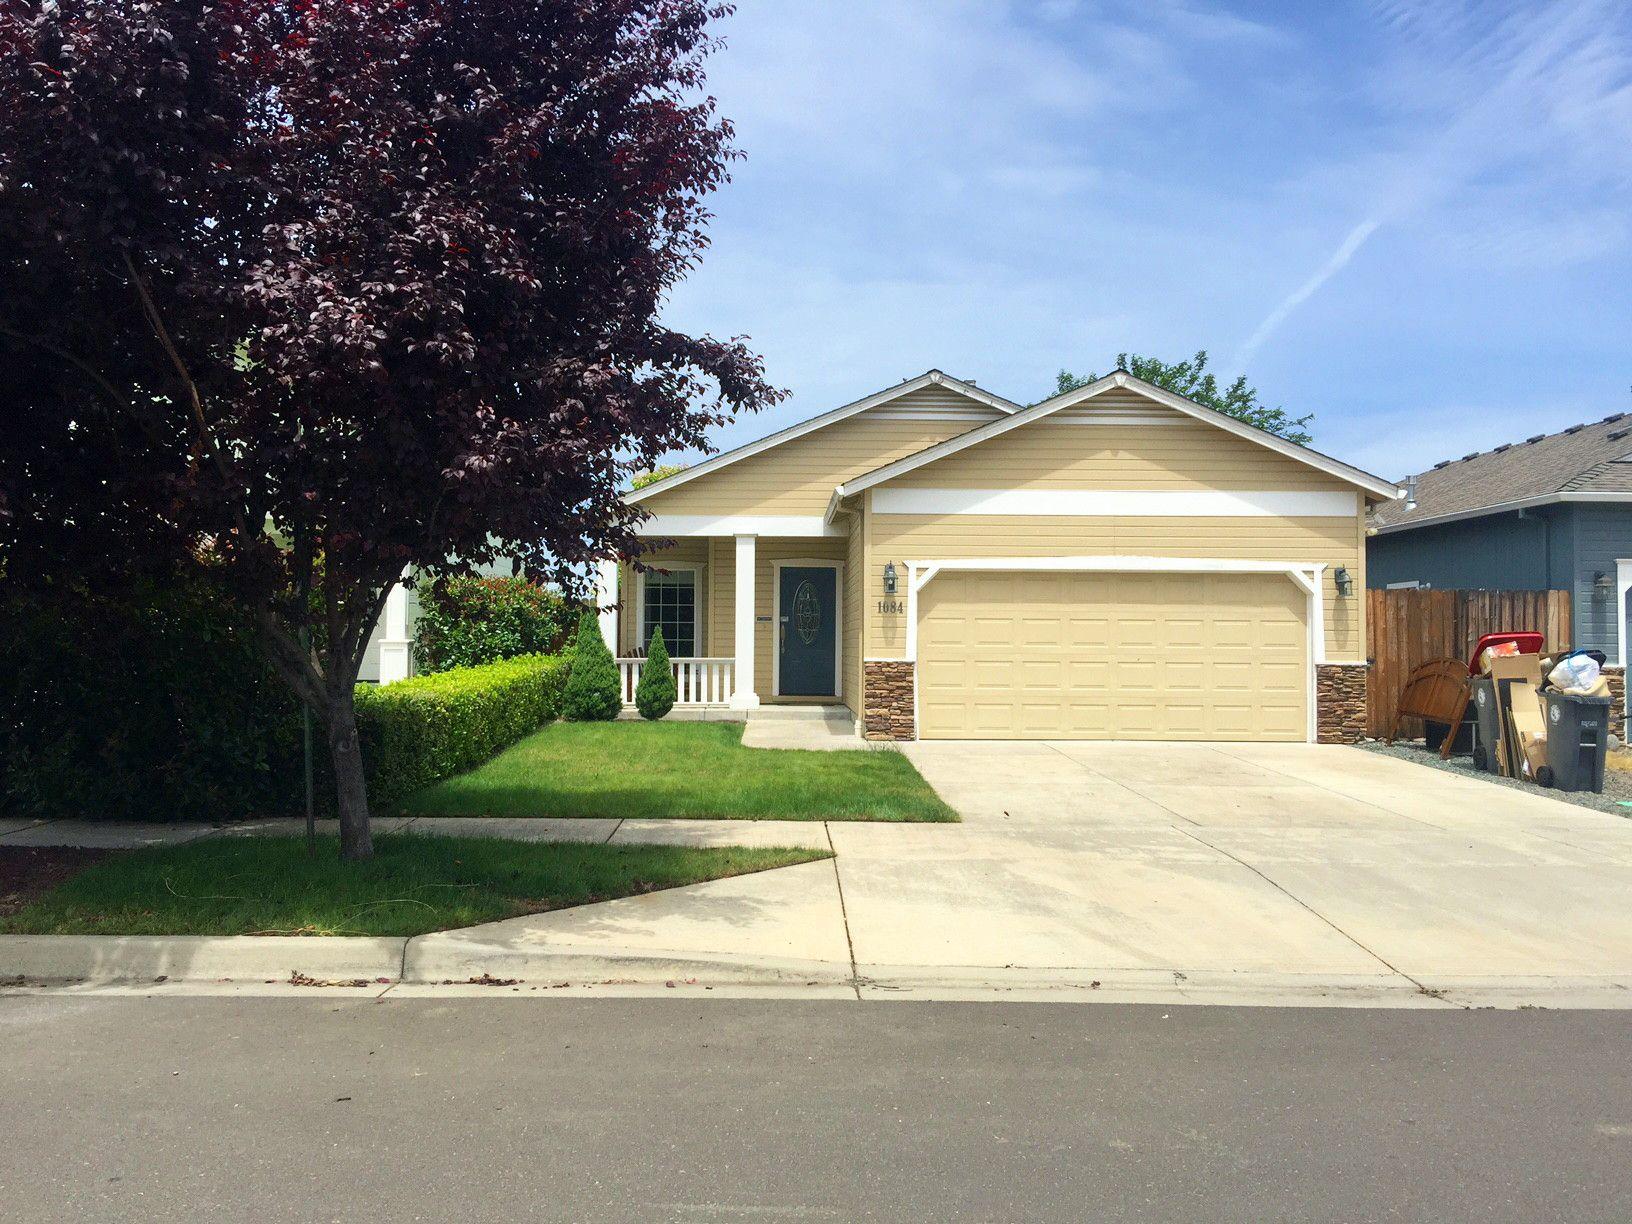 1084 Katie Mae Drive Medford Oregon 97501 Landline Real Estate Llc Real Estate Custom Cabinetry Granite Countertops